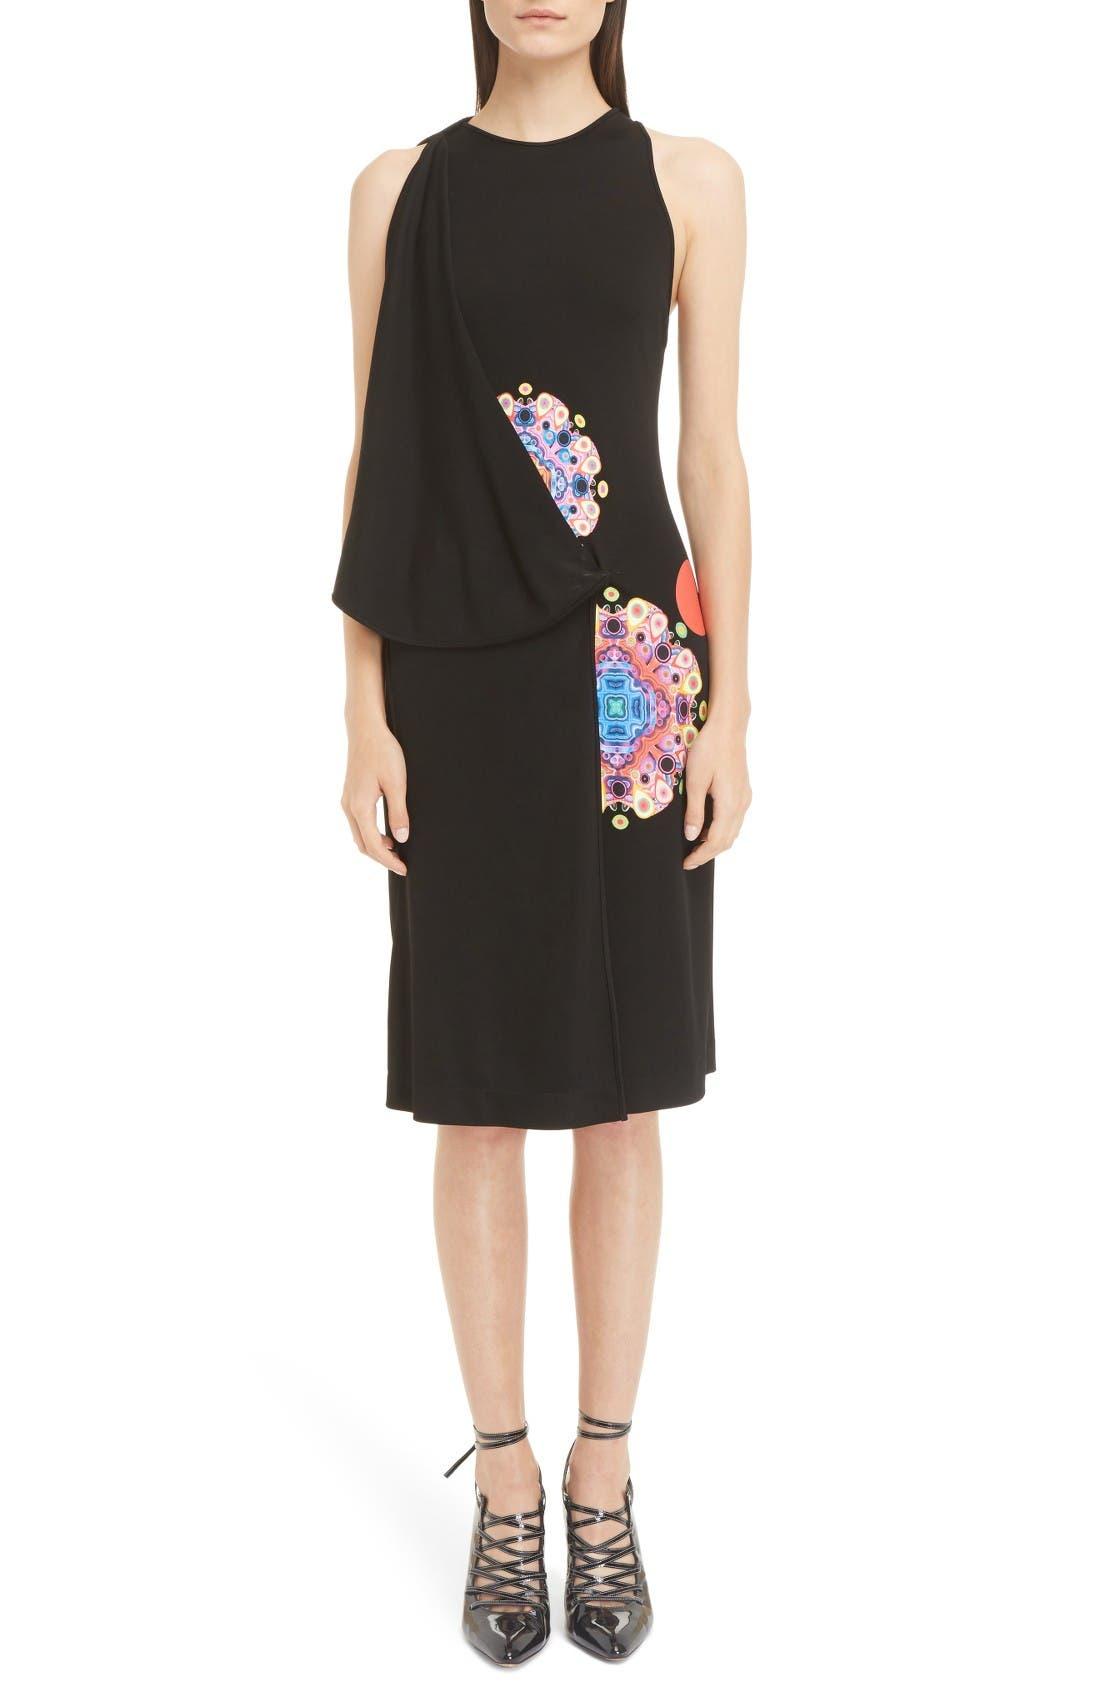 GIVENCHY Mandala Print Crepe Dress